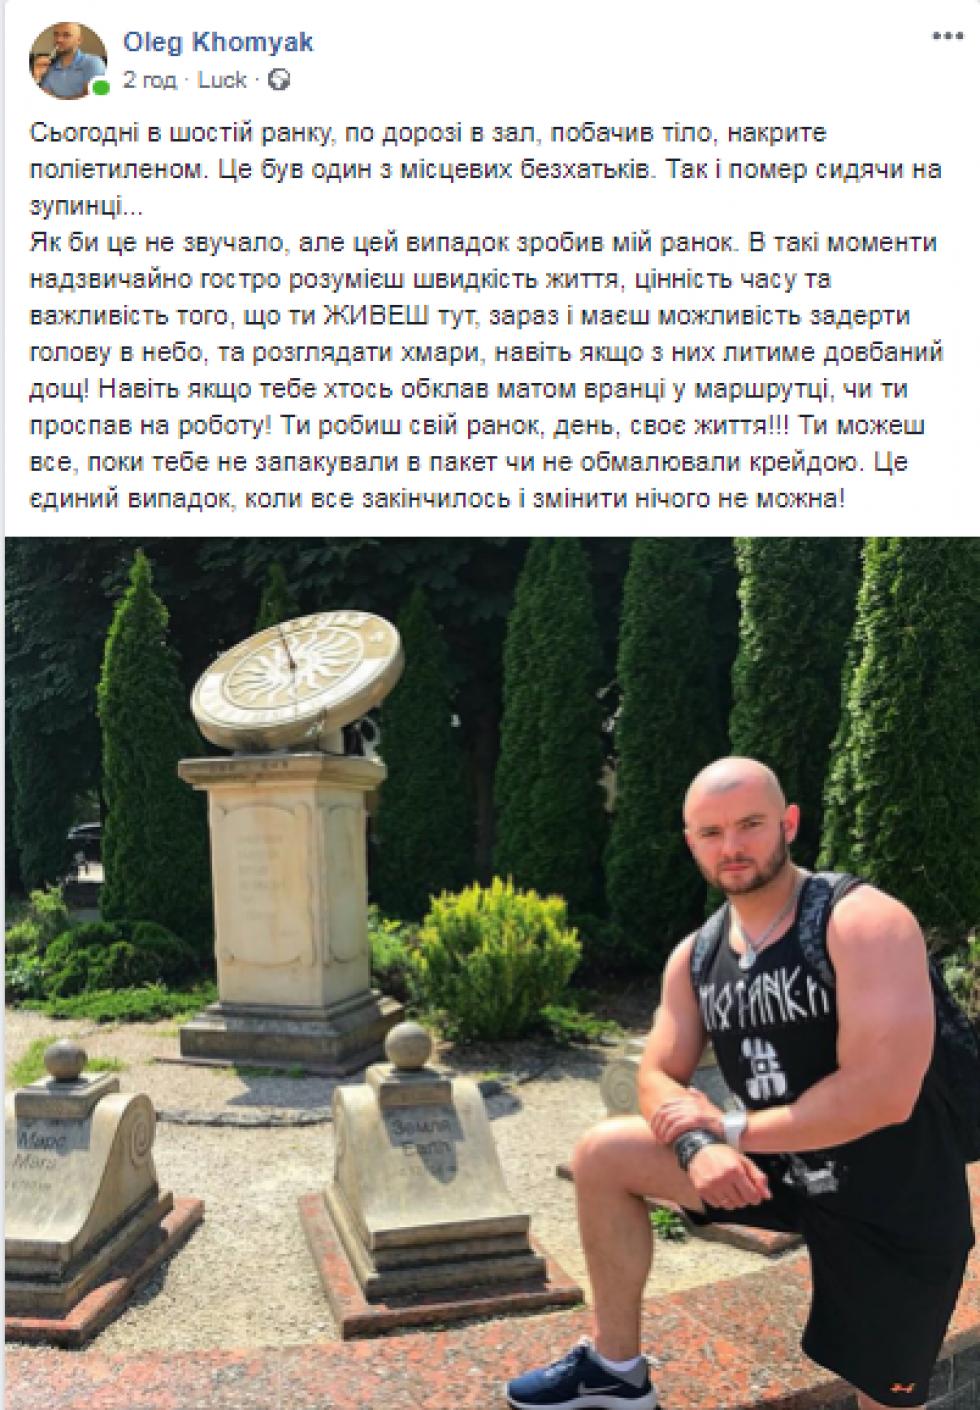 Допис спортсмена